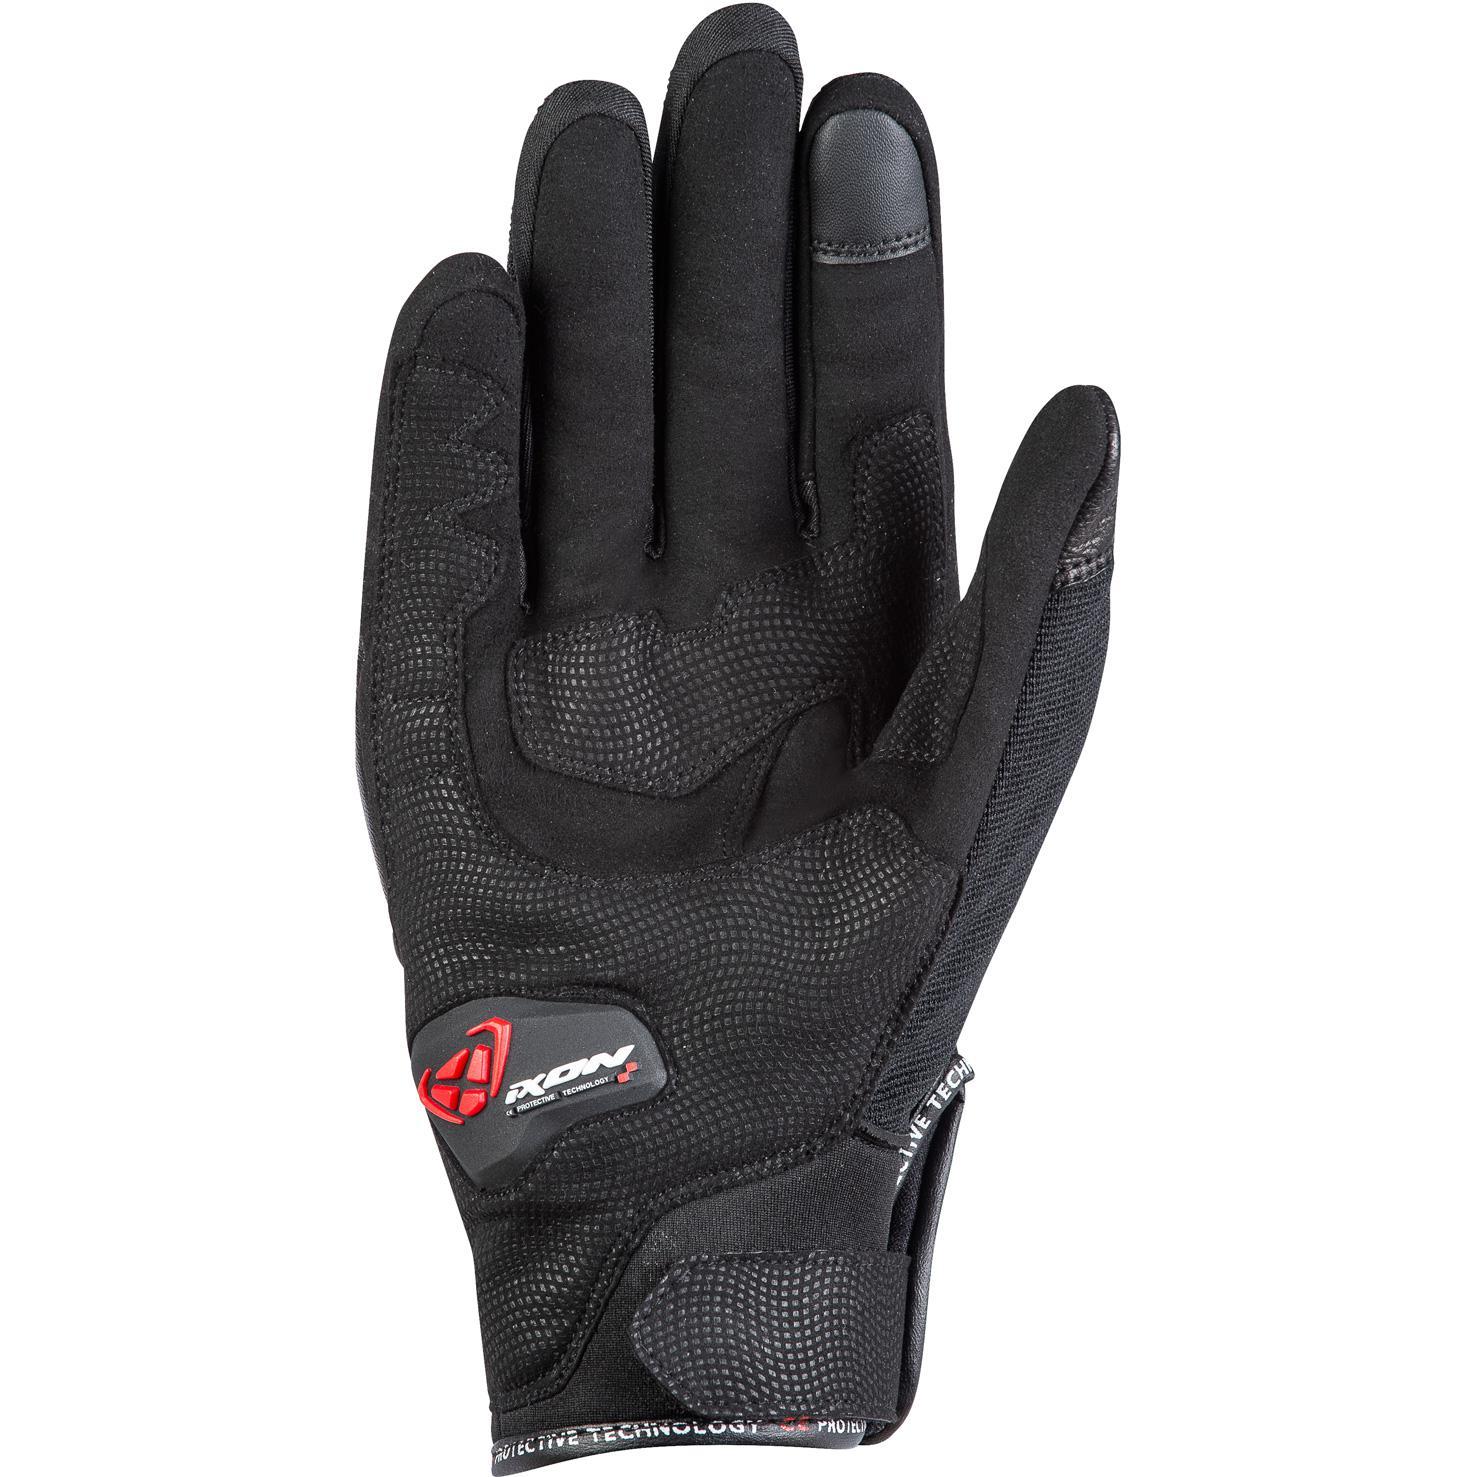 IXON-gants-rs-run-image-10720569